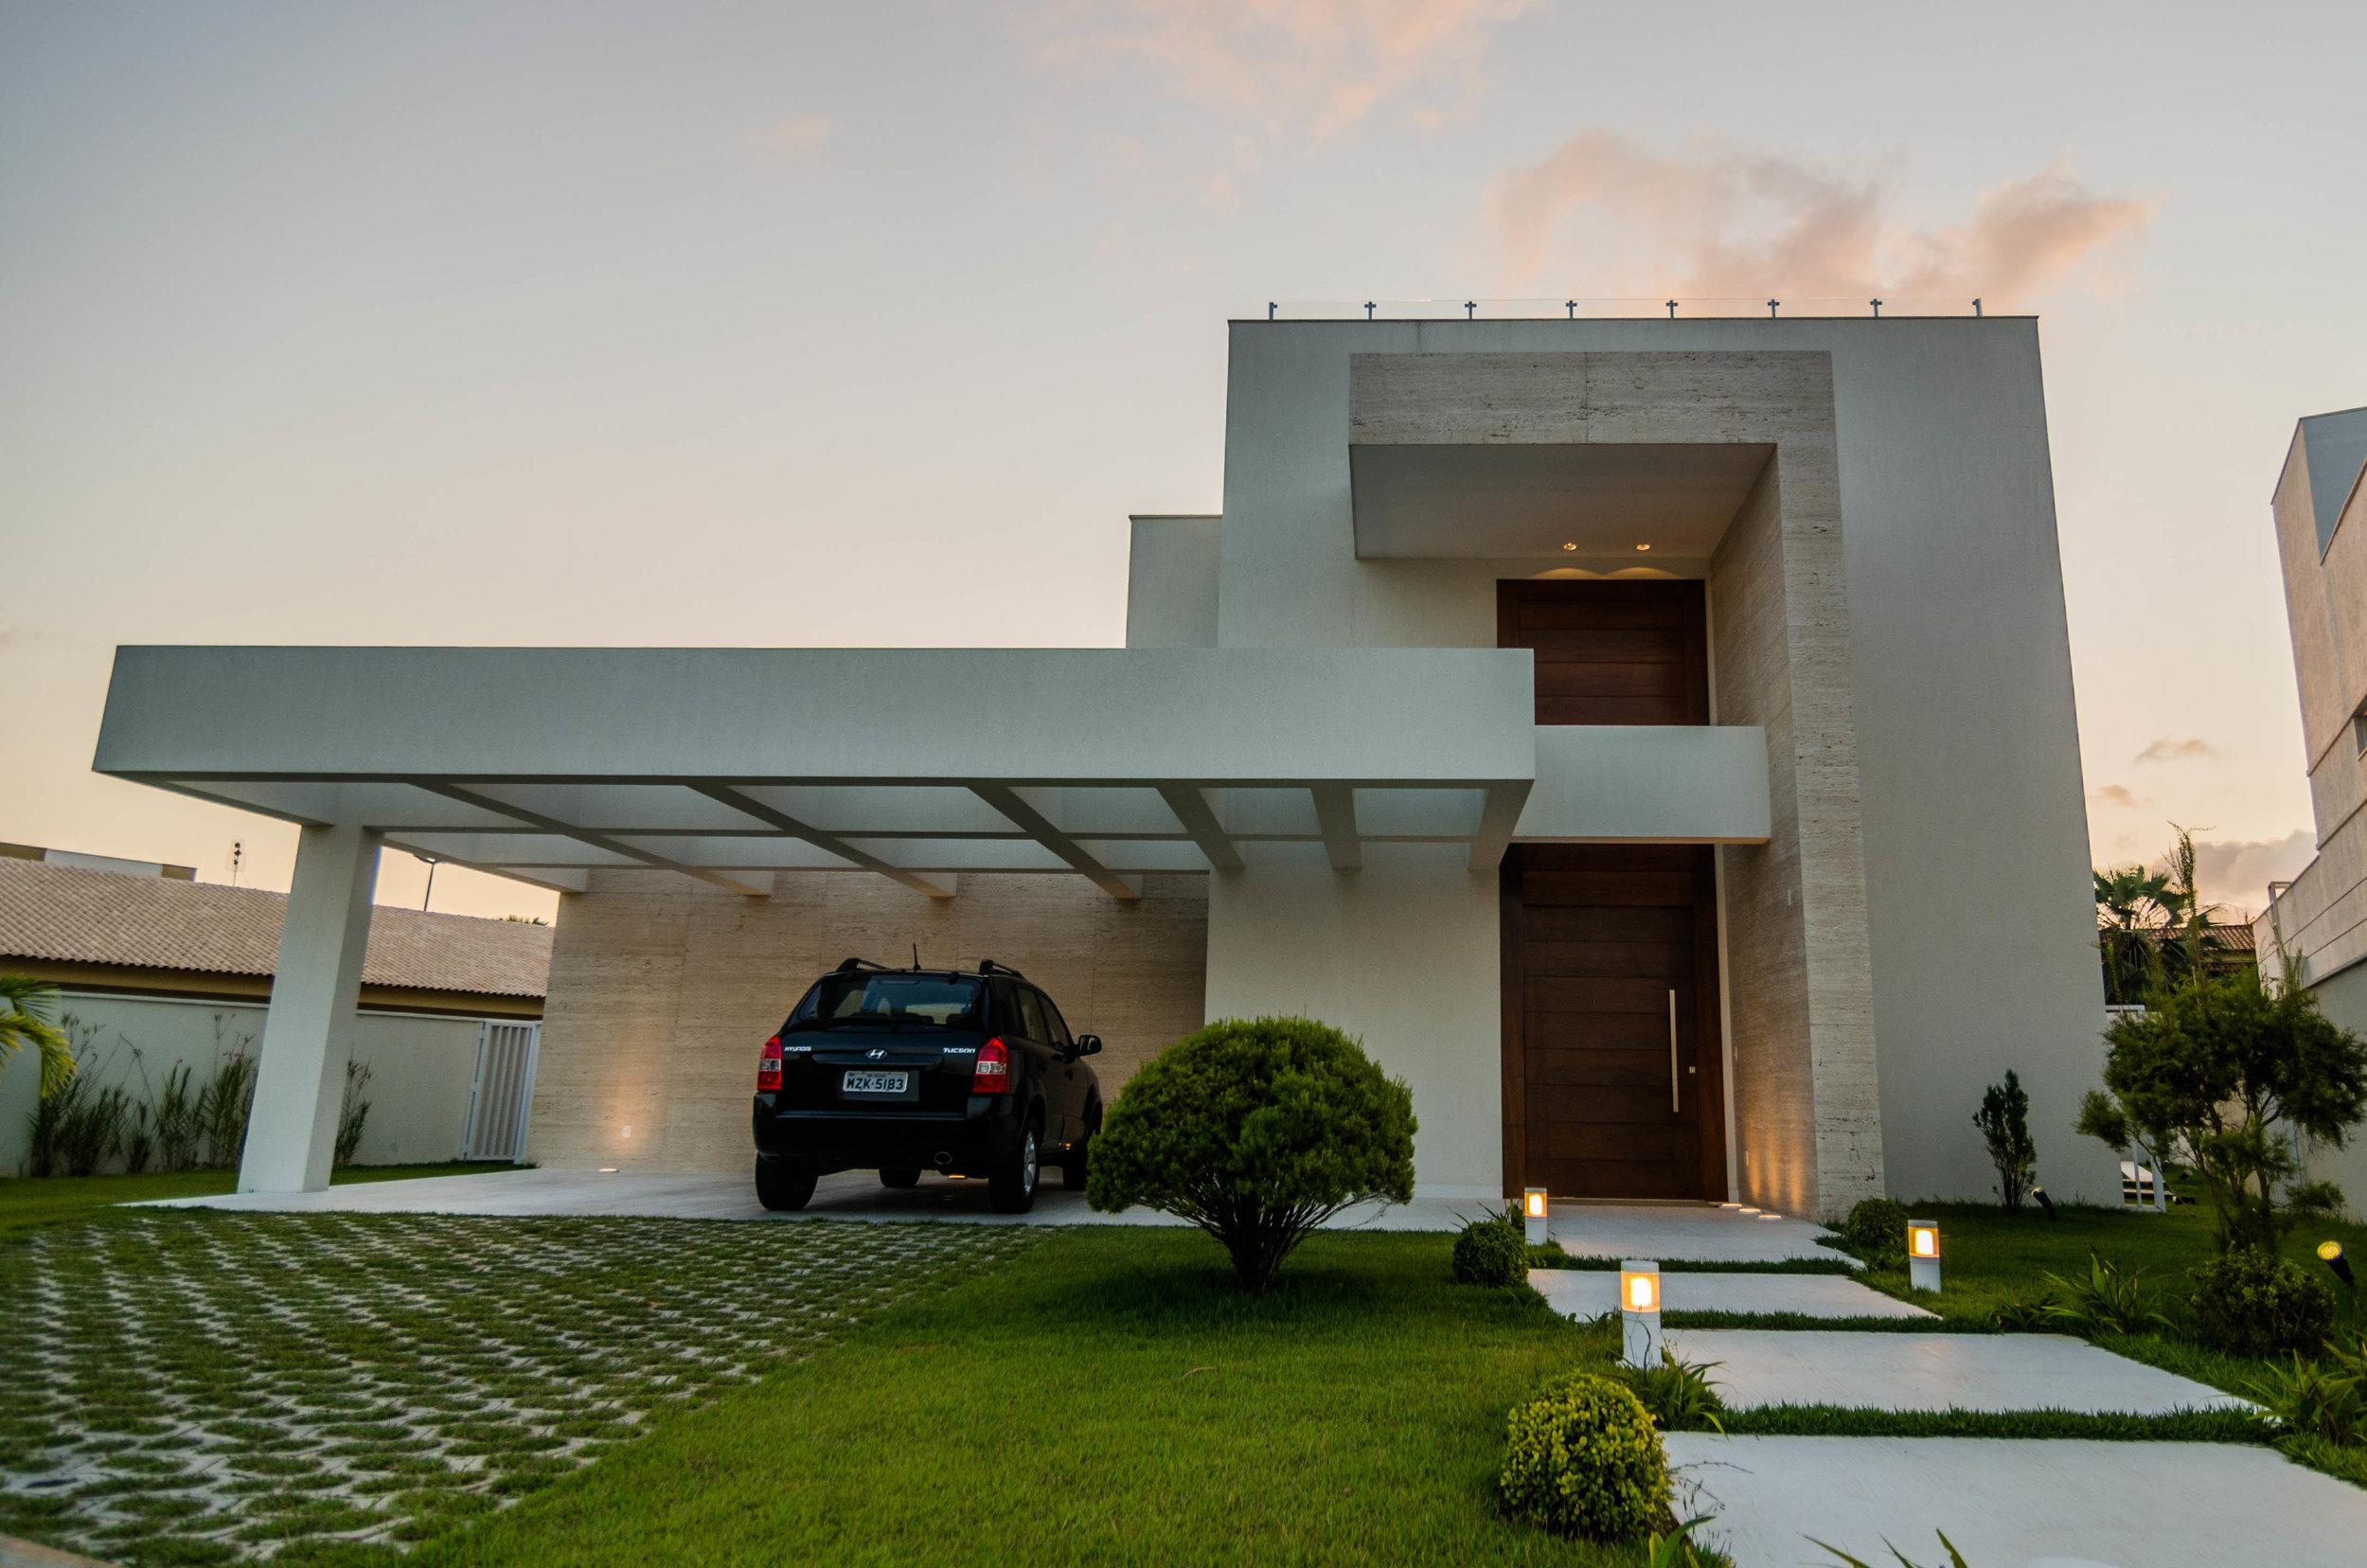 projeto-arquitetonico-edenio-duo-arquitetura-casa-025.jpg